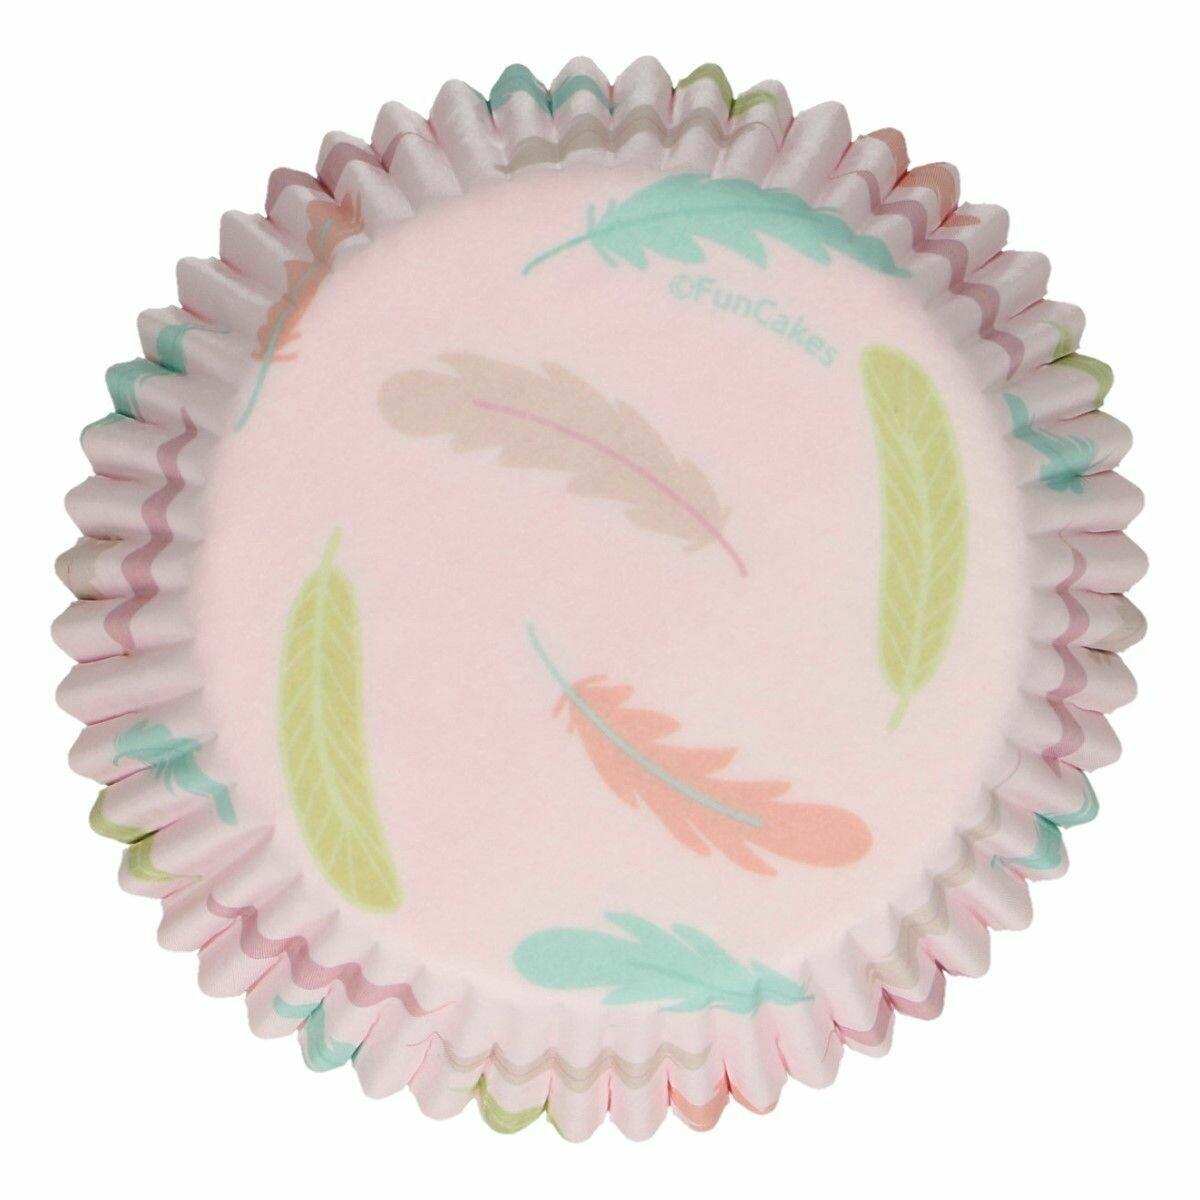 FunCakes Cupcake Cases -PASTEL FEATHERS -Θήκες Ψησίματος Παστέλ Φτερά 48 τεμ